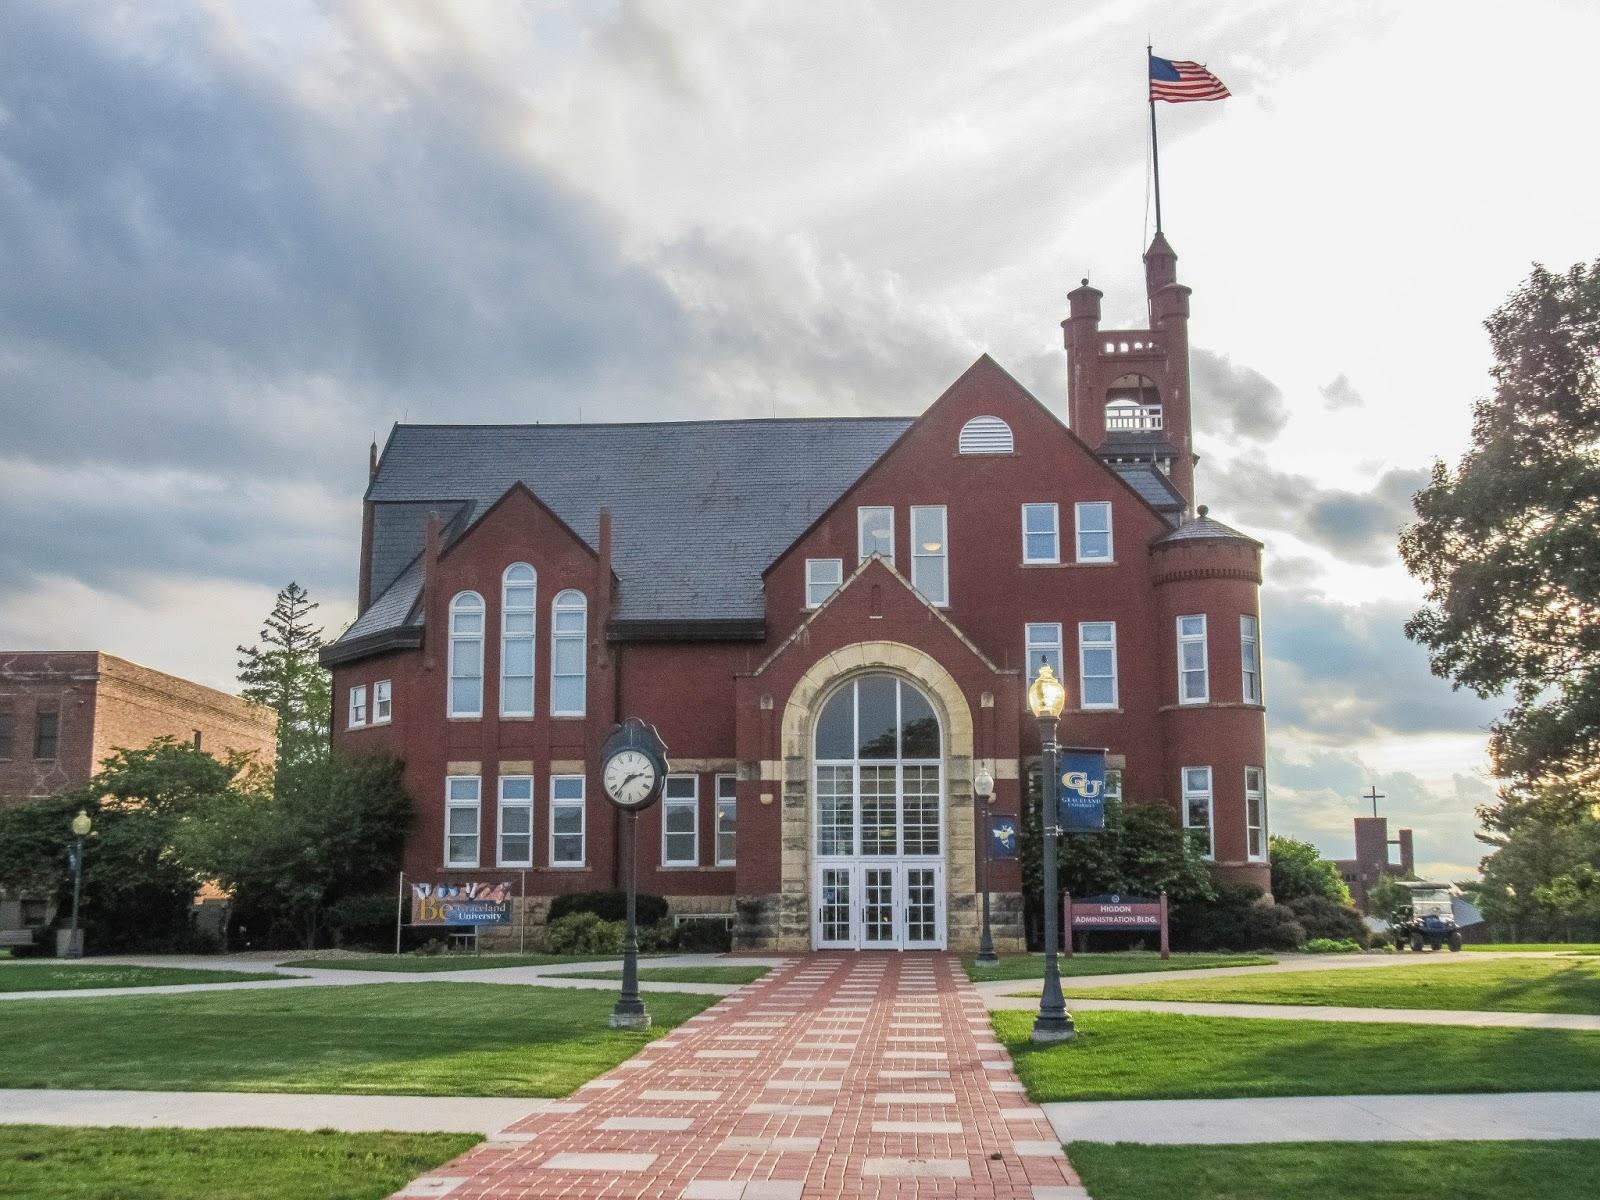 Cannundrums Community of Christ Lamoni, Iowa and Graceland University